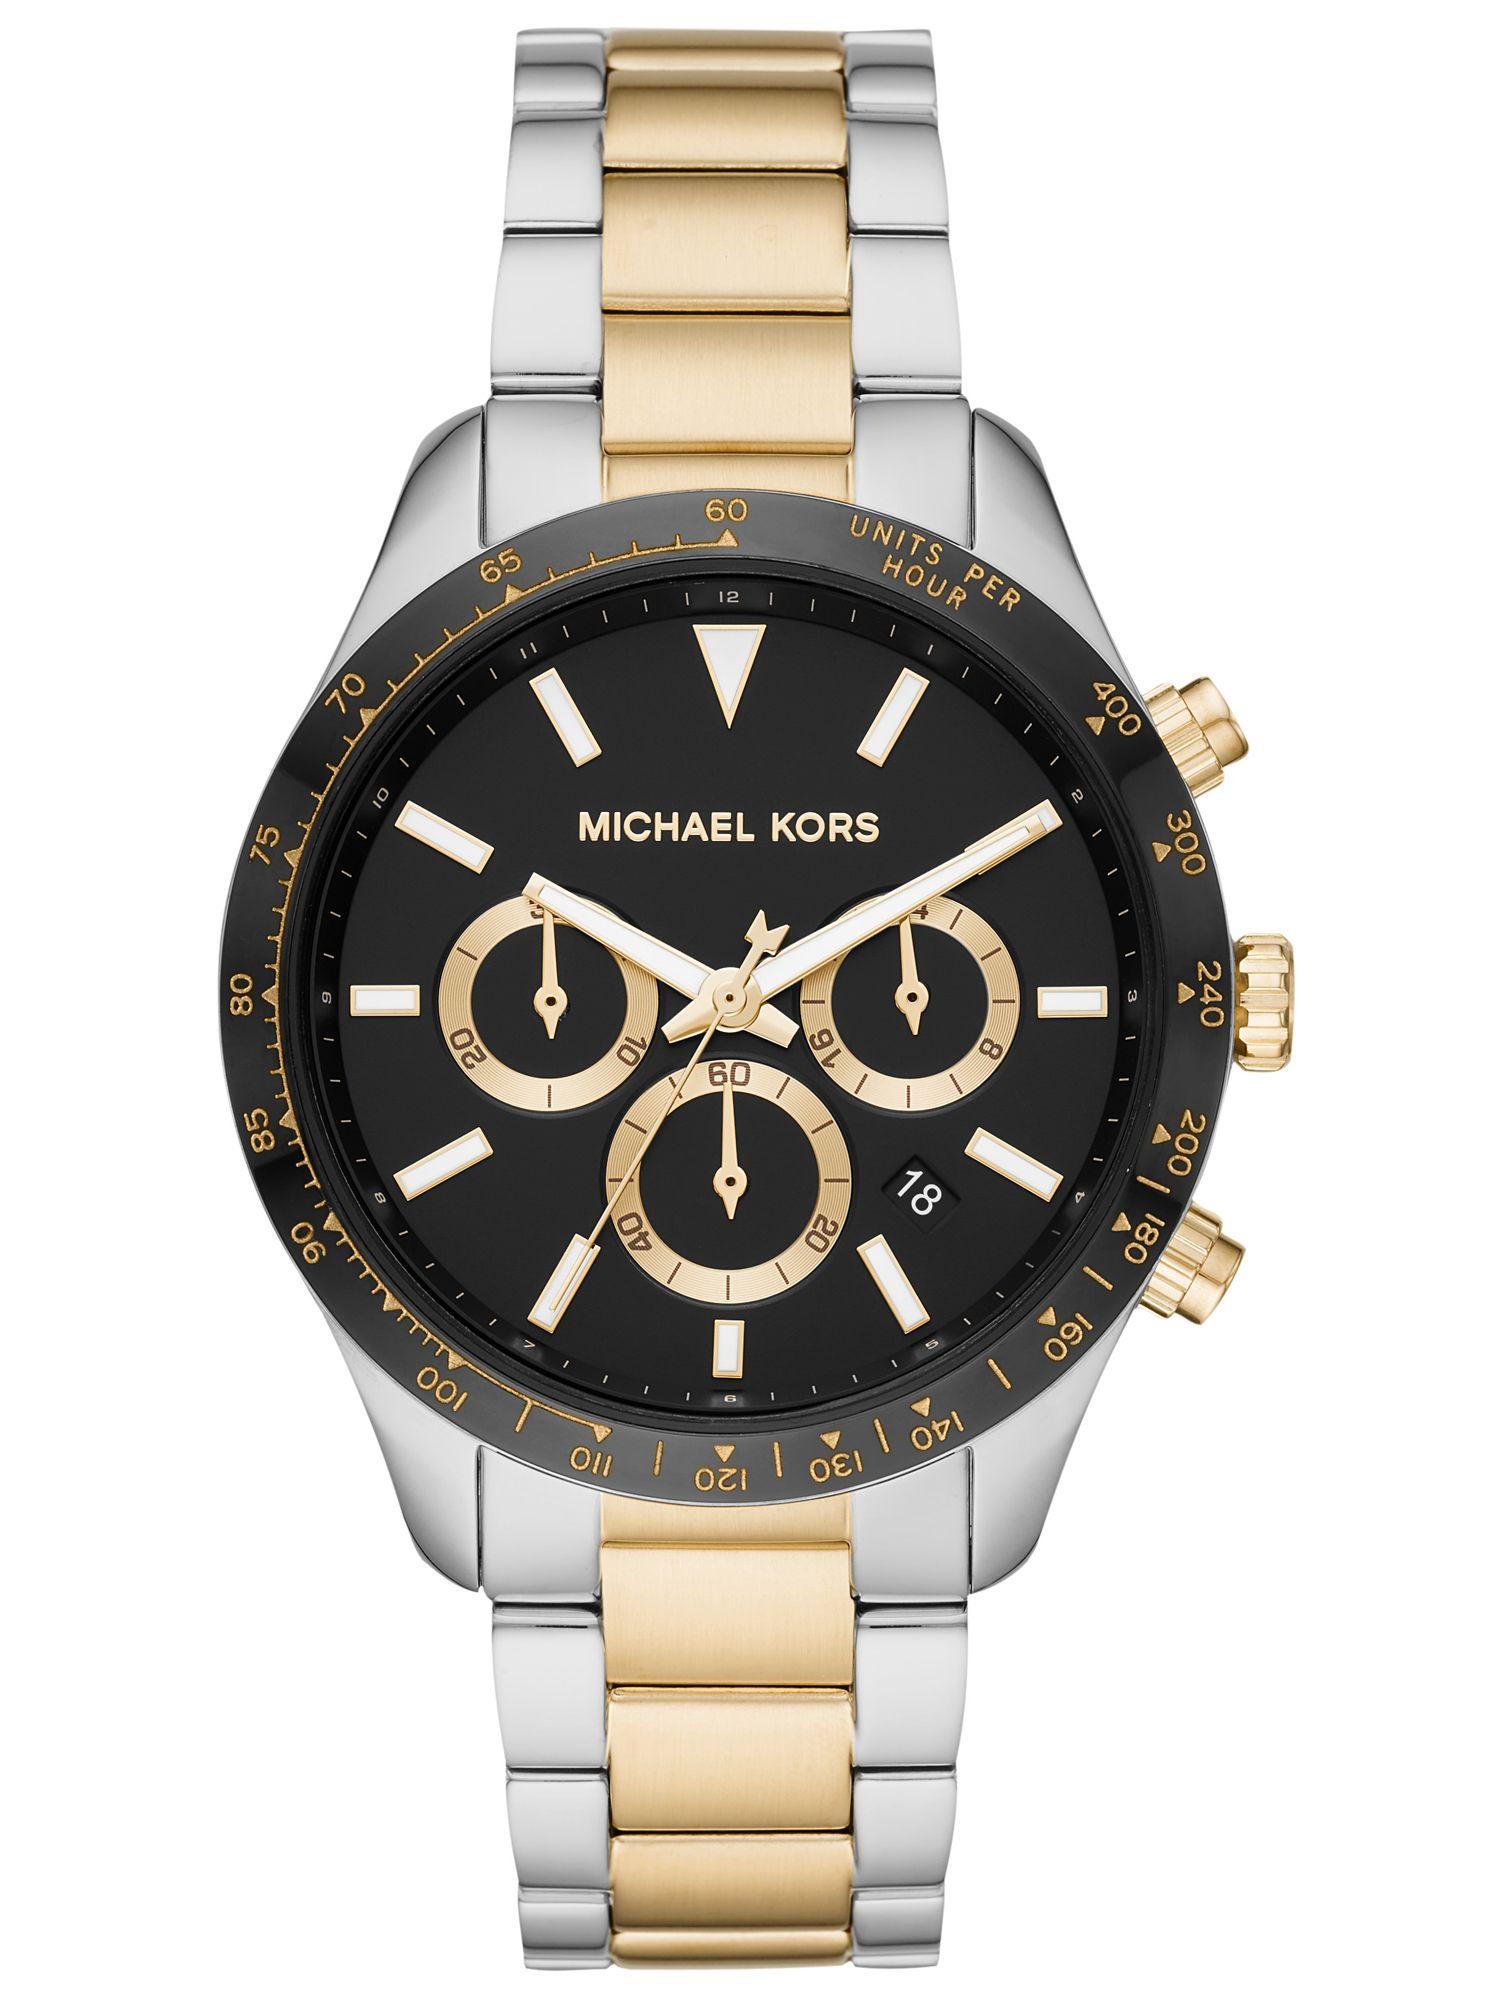 Michael Kors MK6835 Uhr Herrenuhr Edelstahl Chrono Datum bicolor